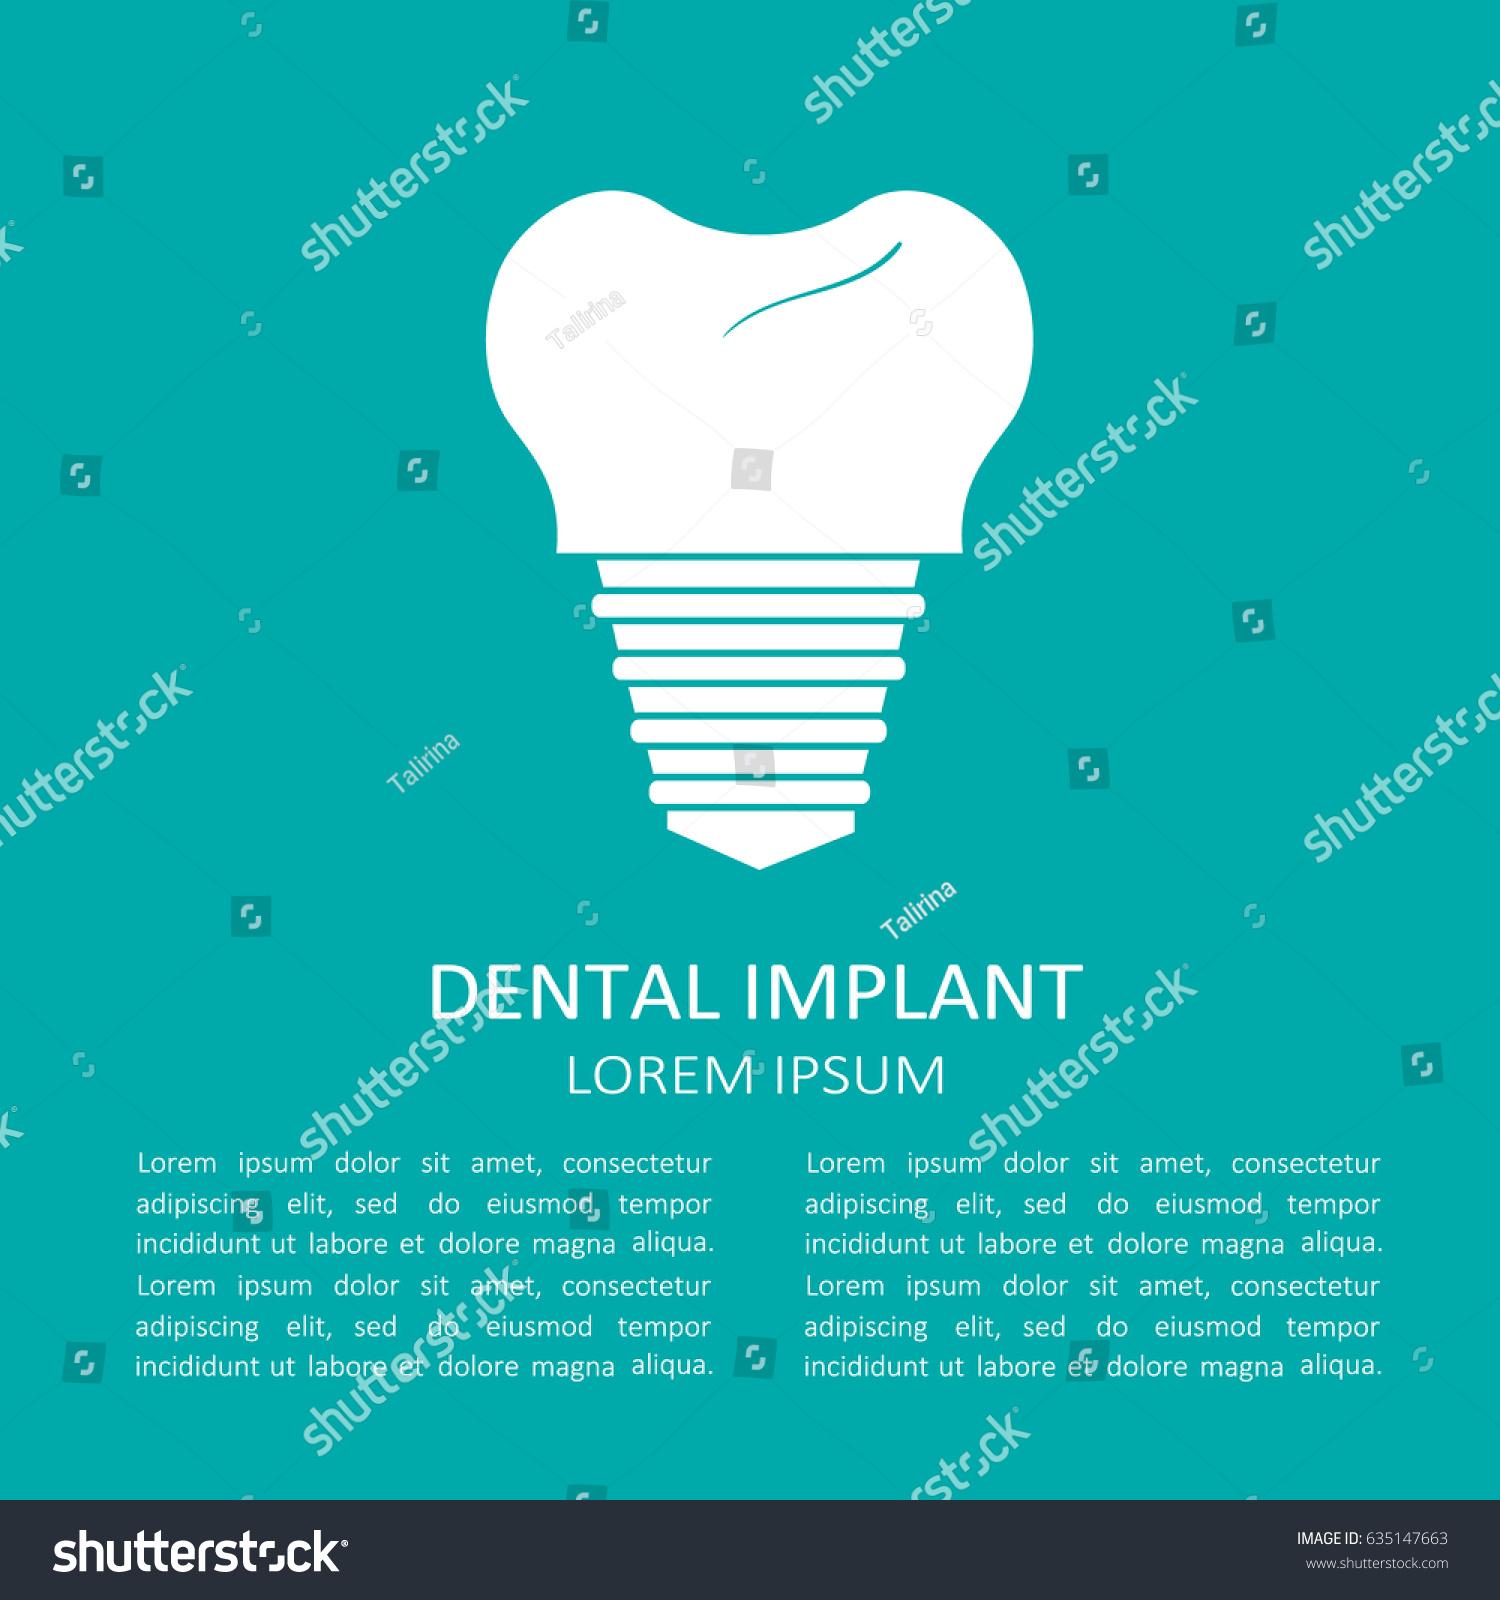 Medical Illustration Symbol Dental Implant Text Stock Vector